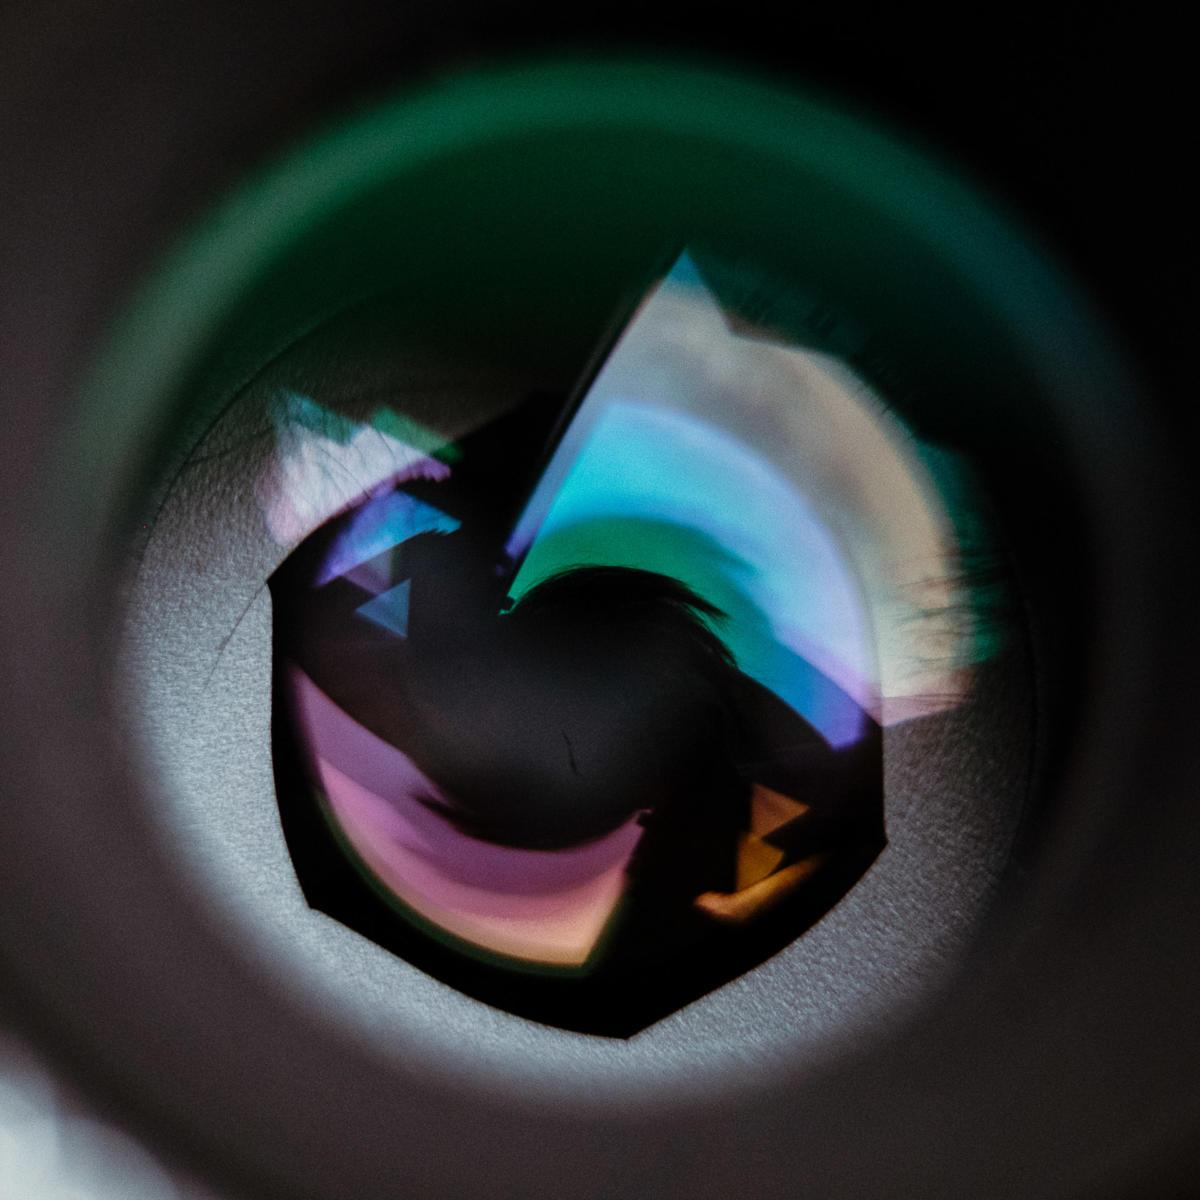 Objektiv Blende f/2.8